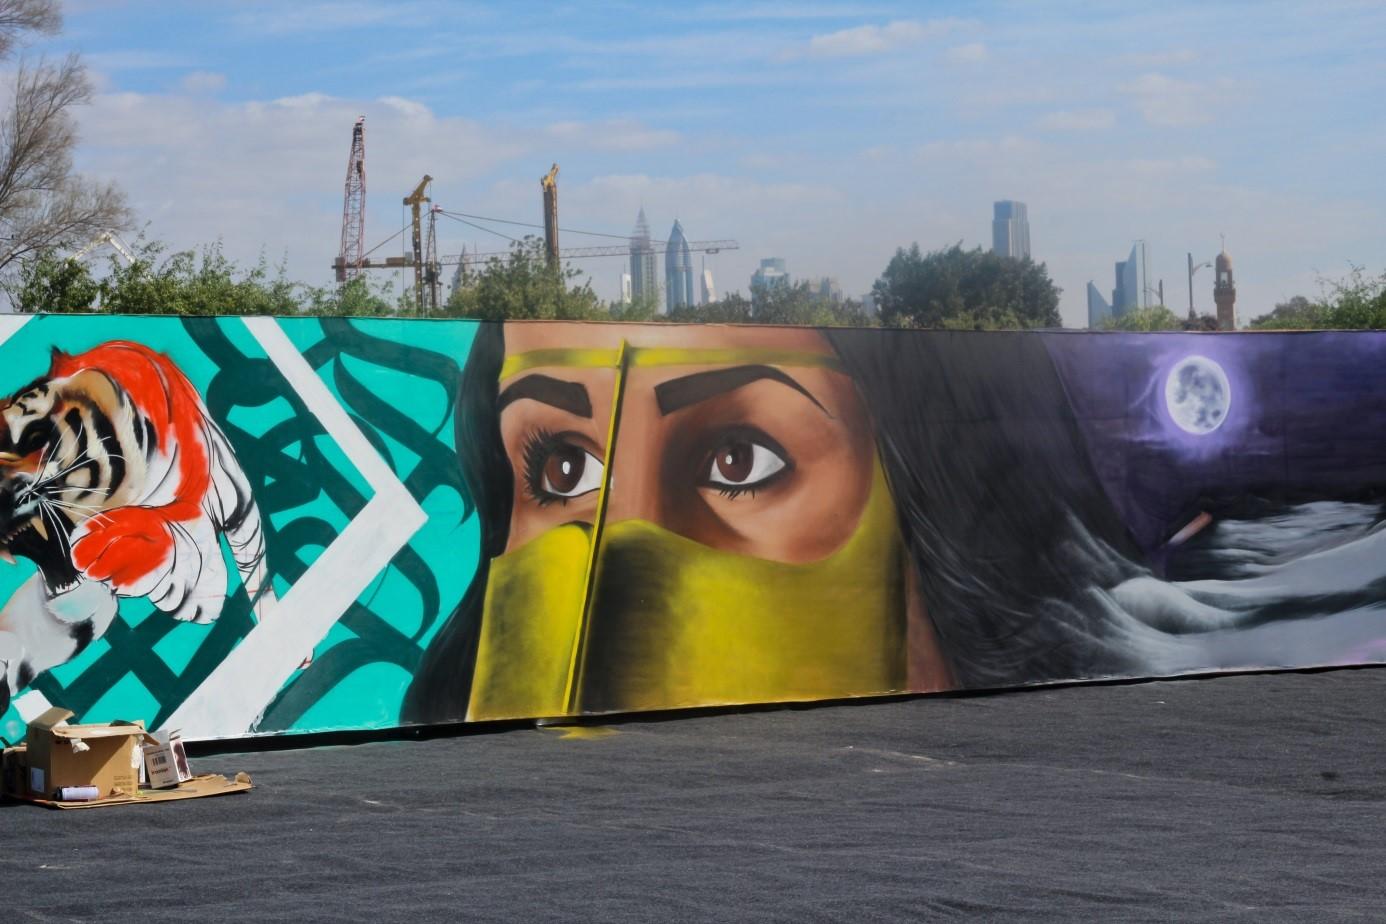 Graffiti wall uae - Graffiti Wall Uae 8